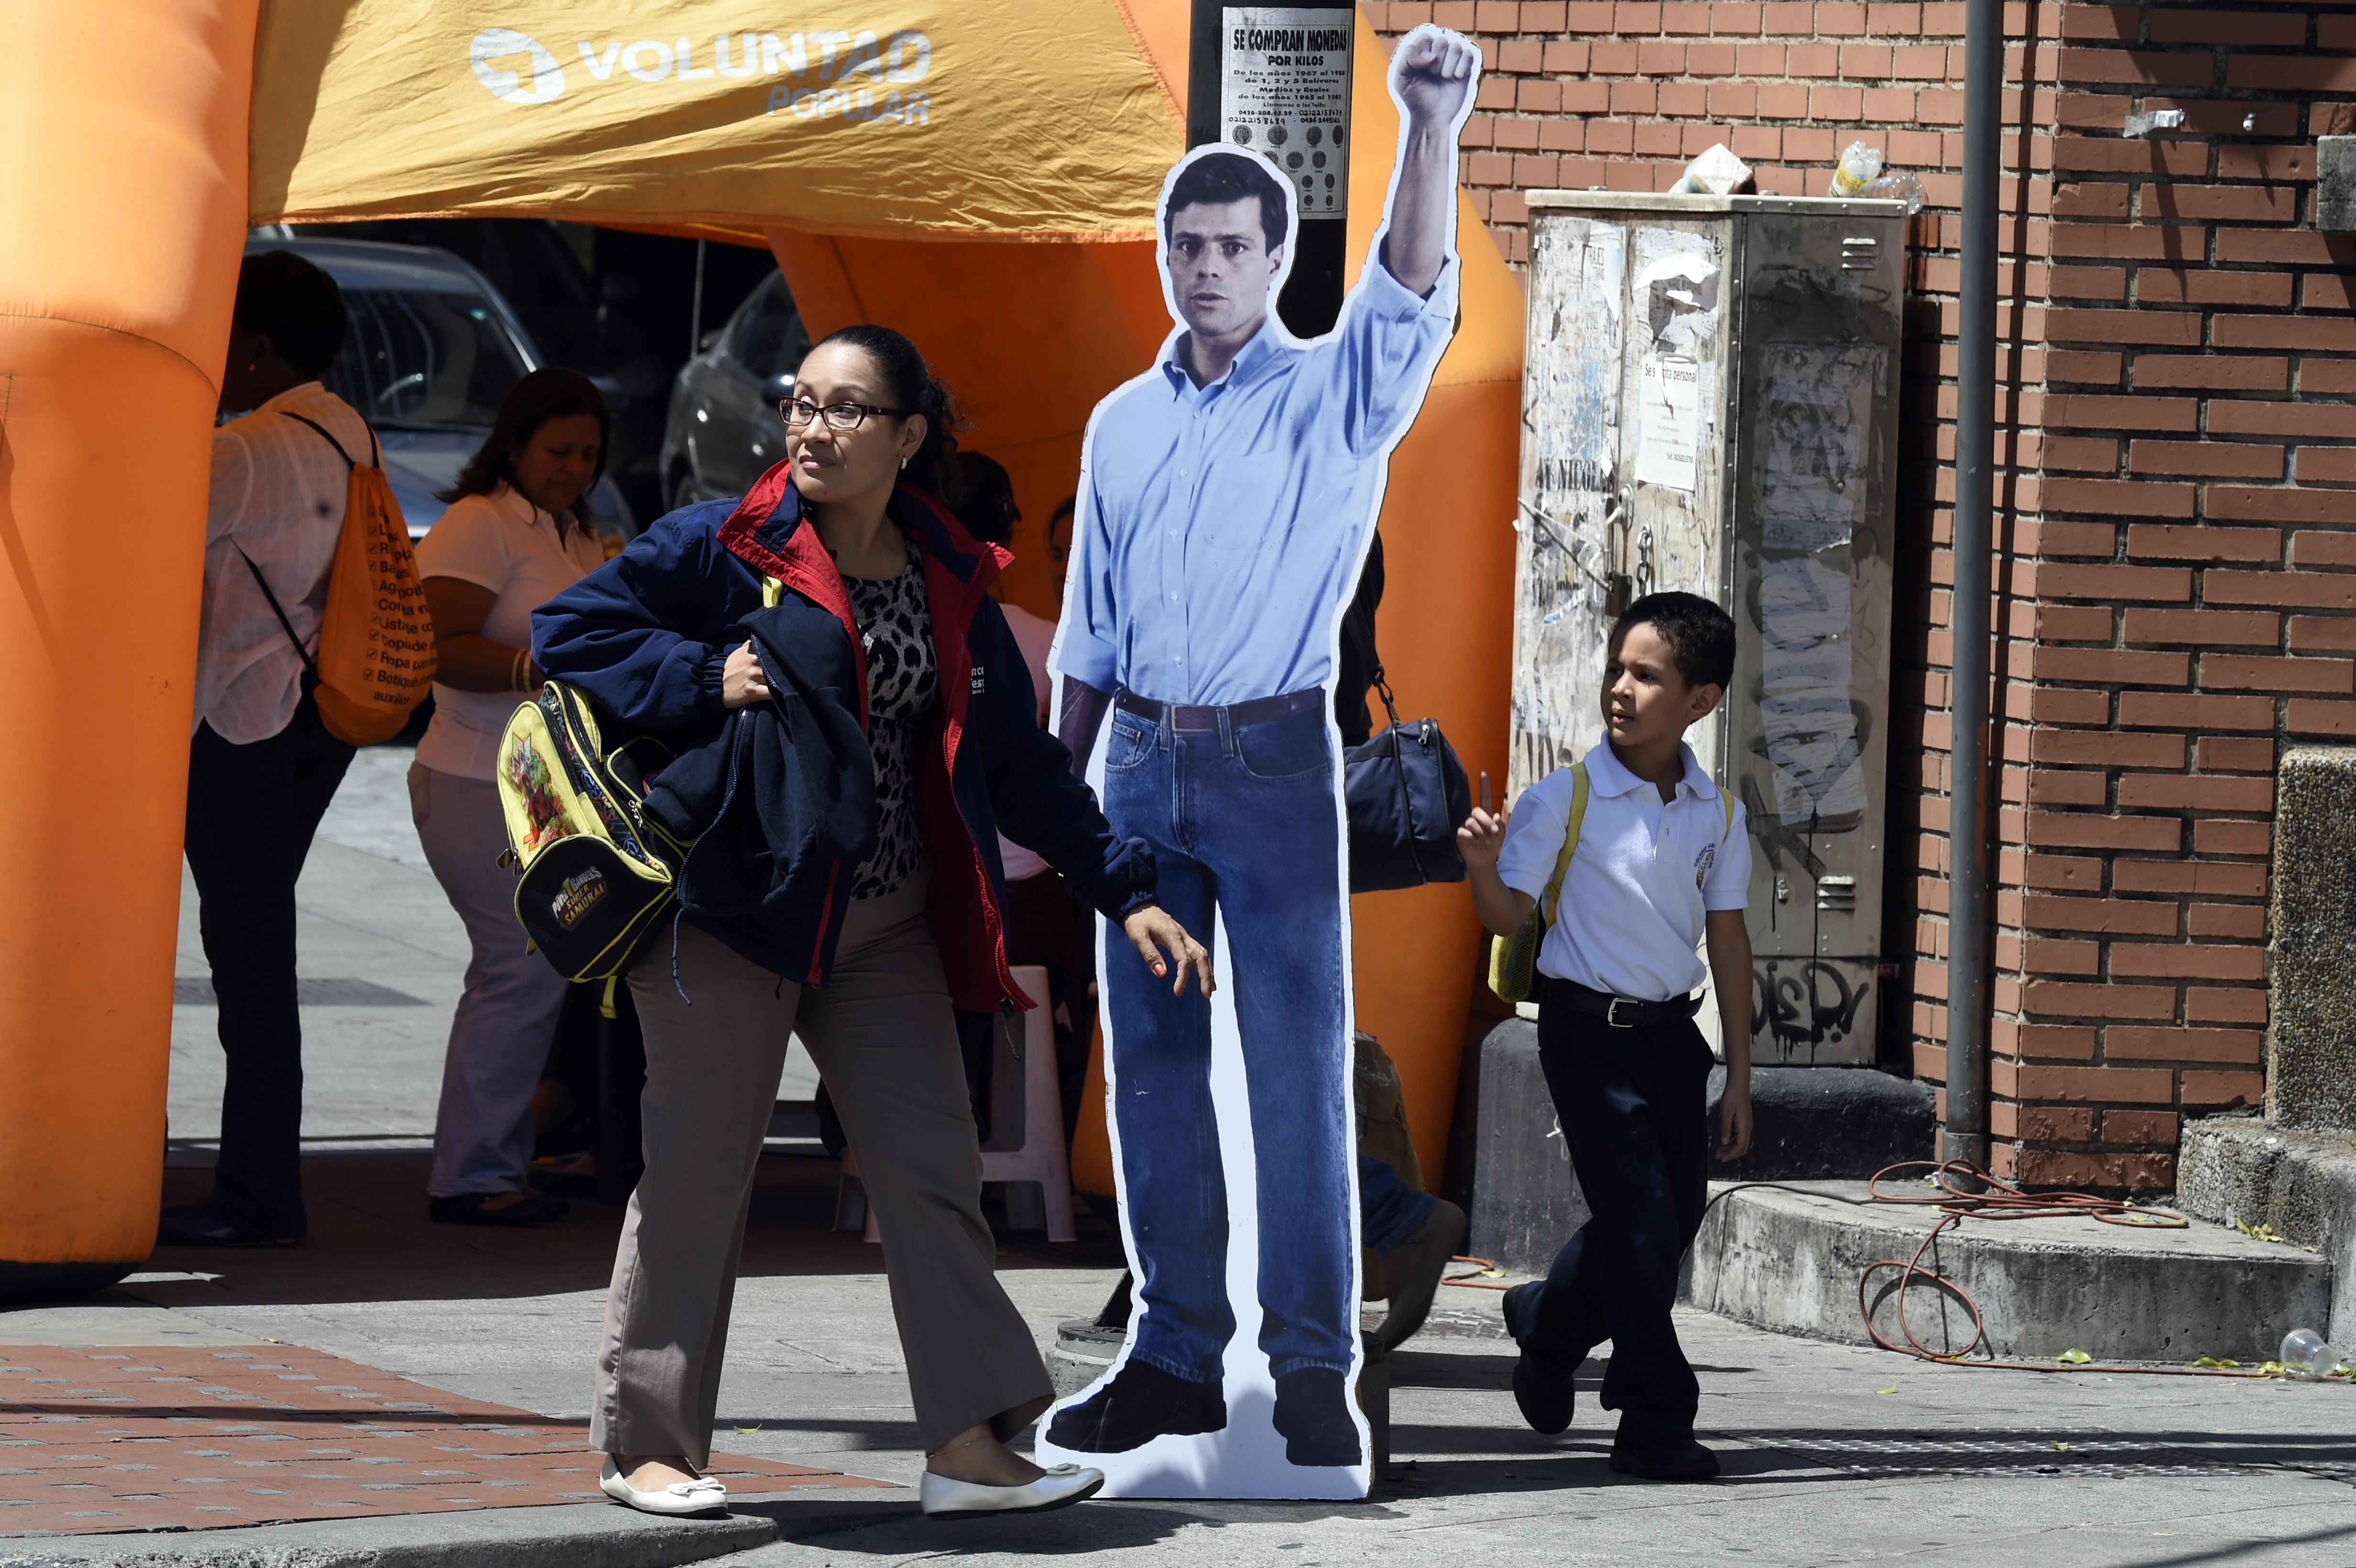 VENEZUELA-POLITCS-LOPEZ-TINTORI